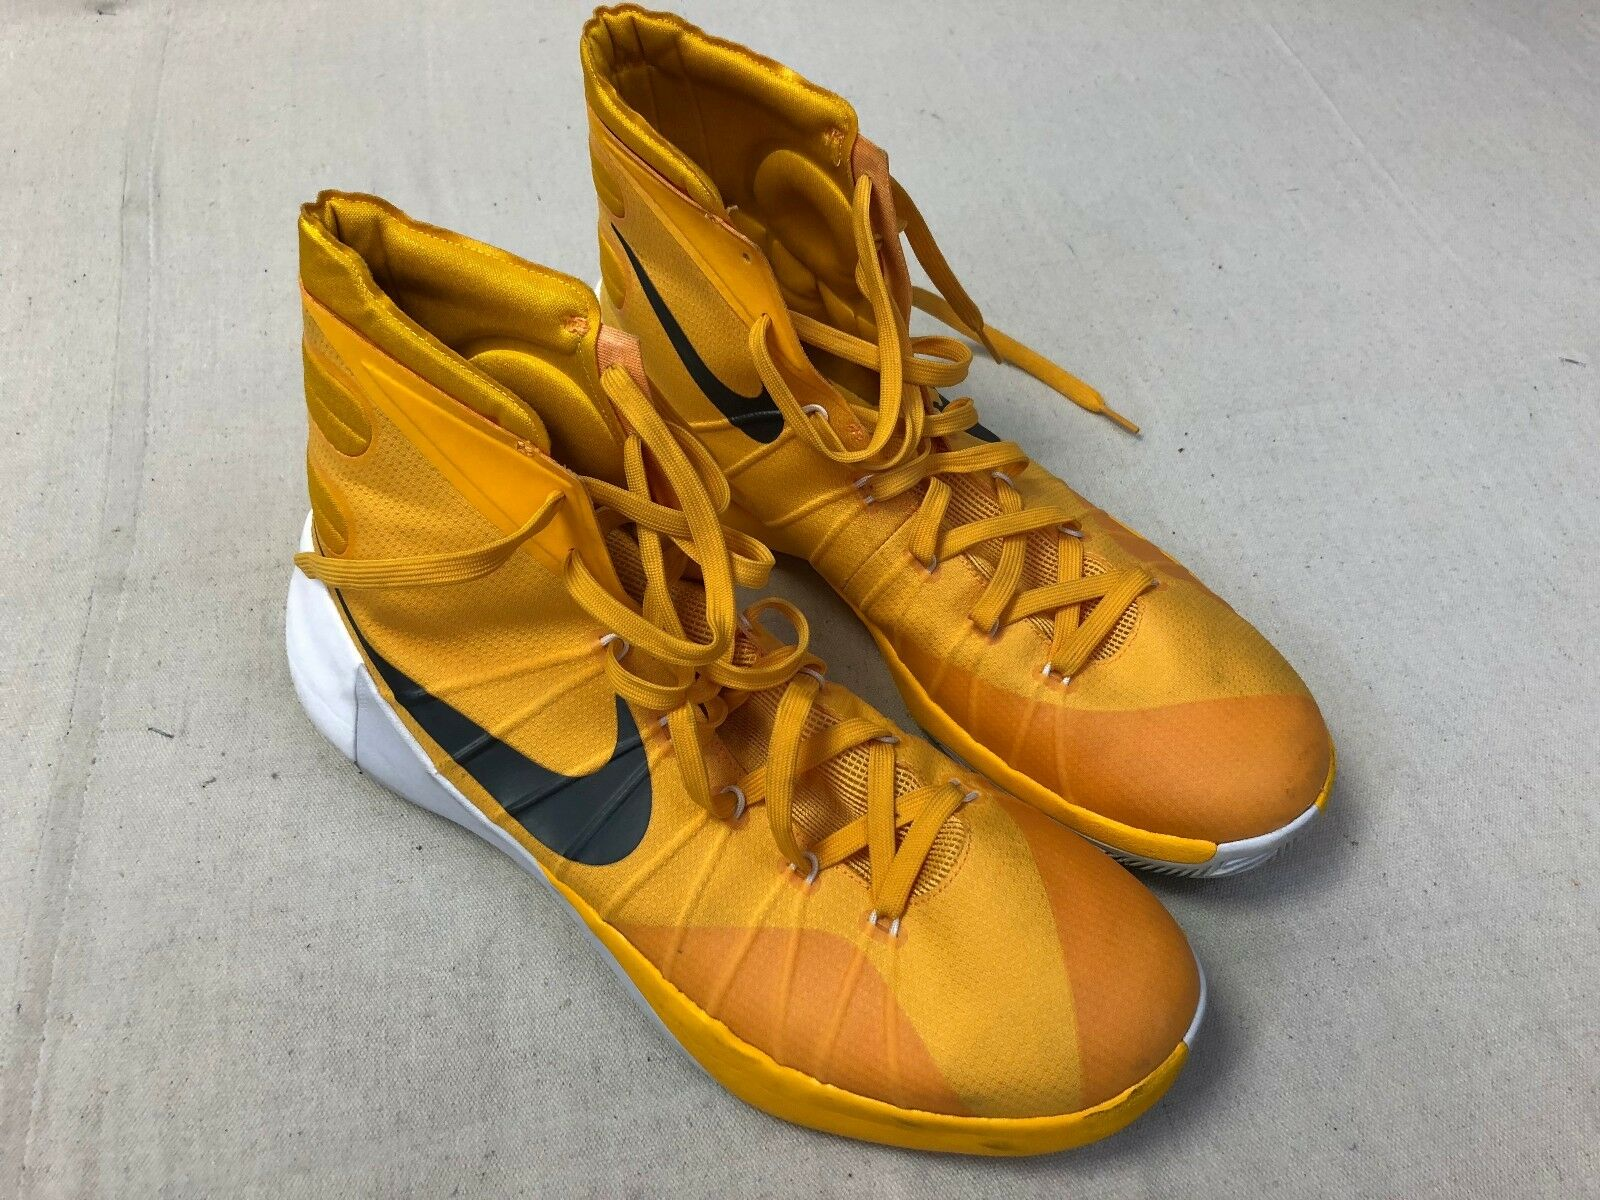 Nike Hyperdunk Sz 14 Basketball Shoes Yellow White USA 812944 711 S05 Brand discount